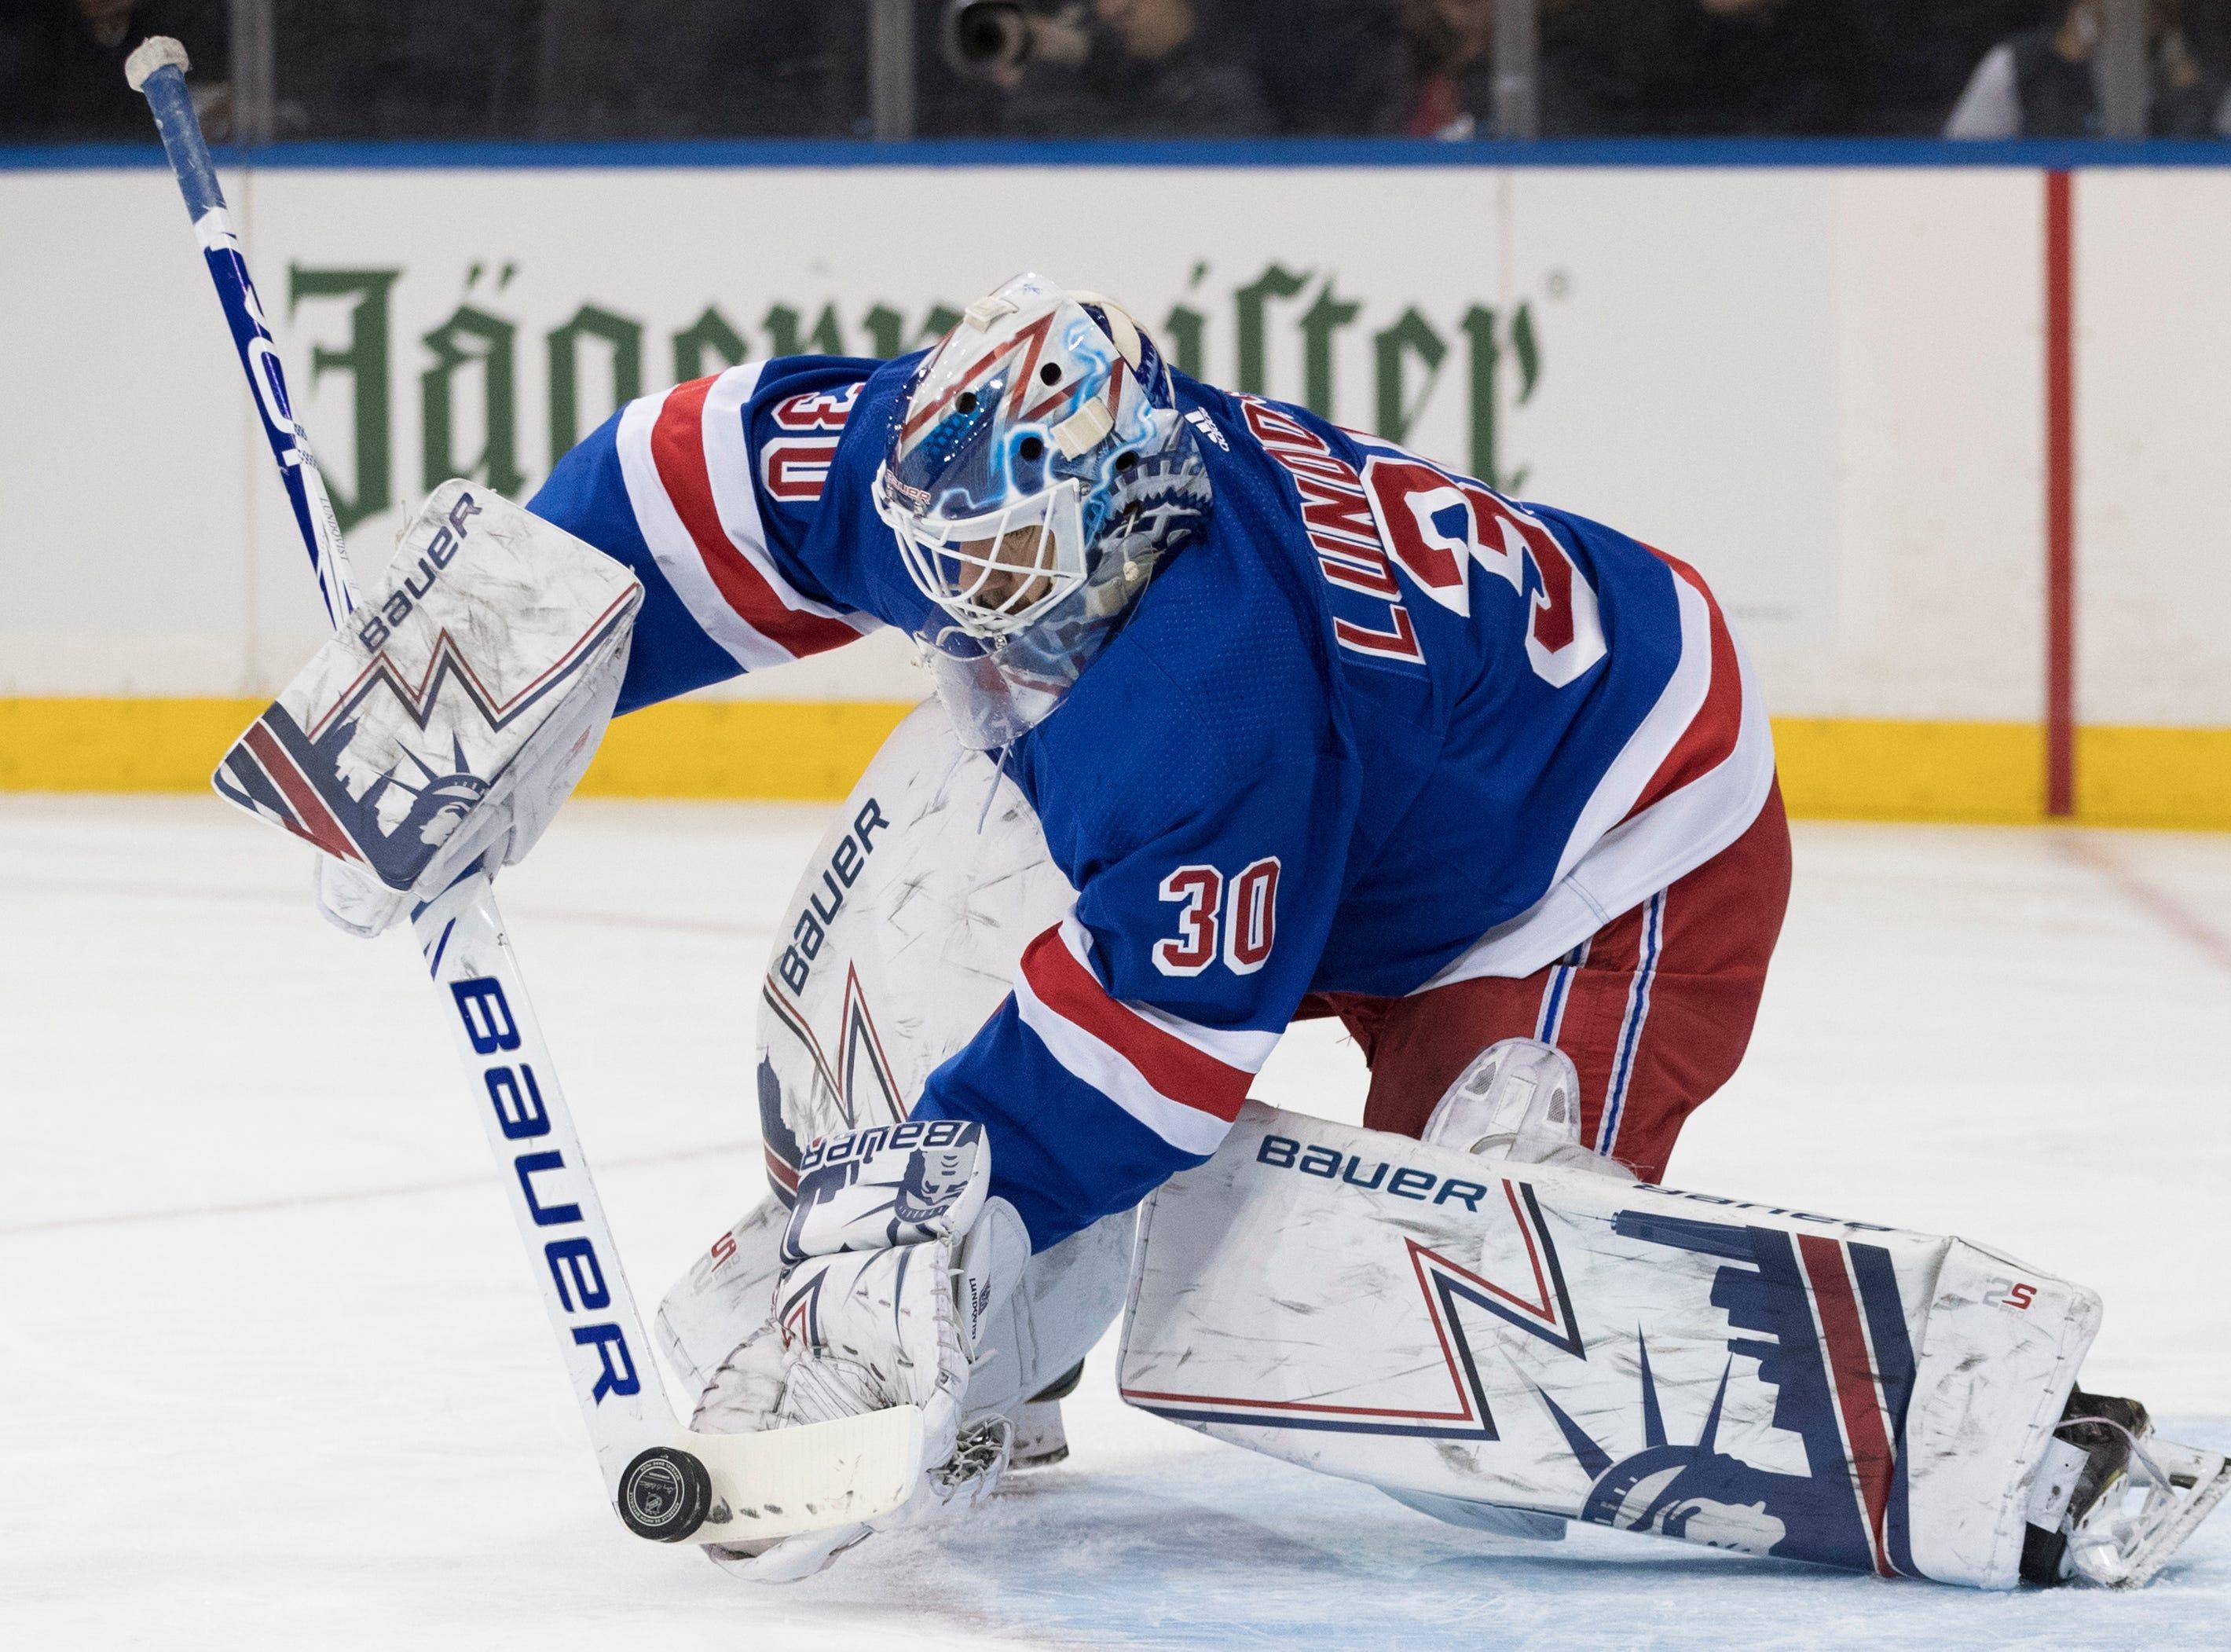 New York Rangers goaltender Henrik Lundqvist makes the save during the first period.